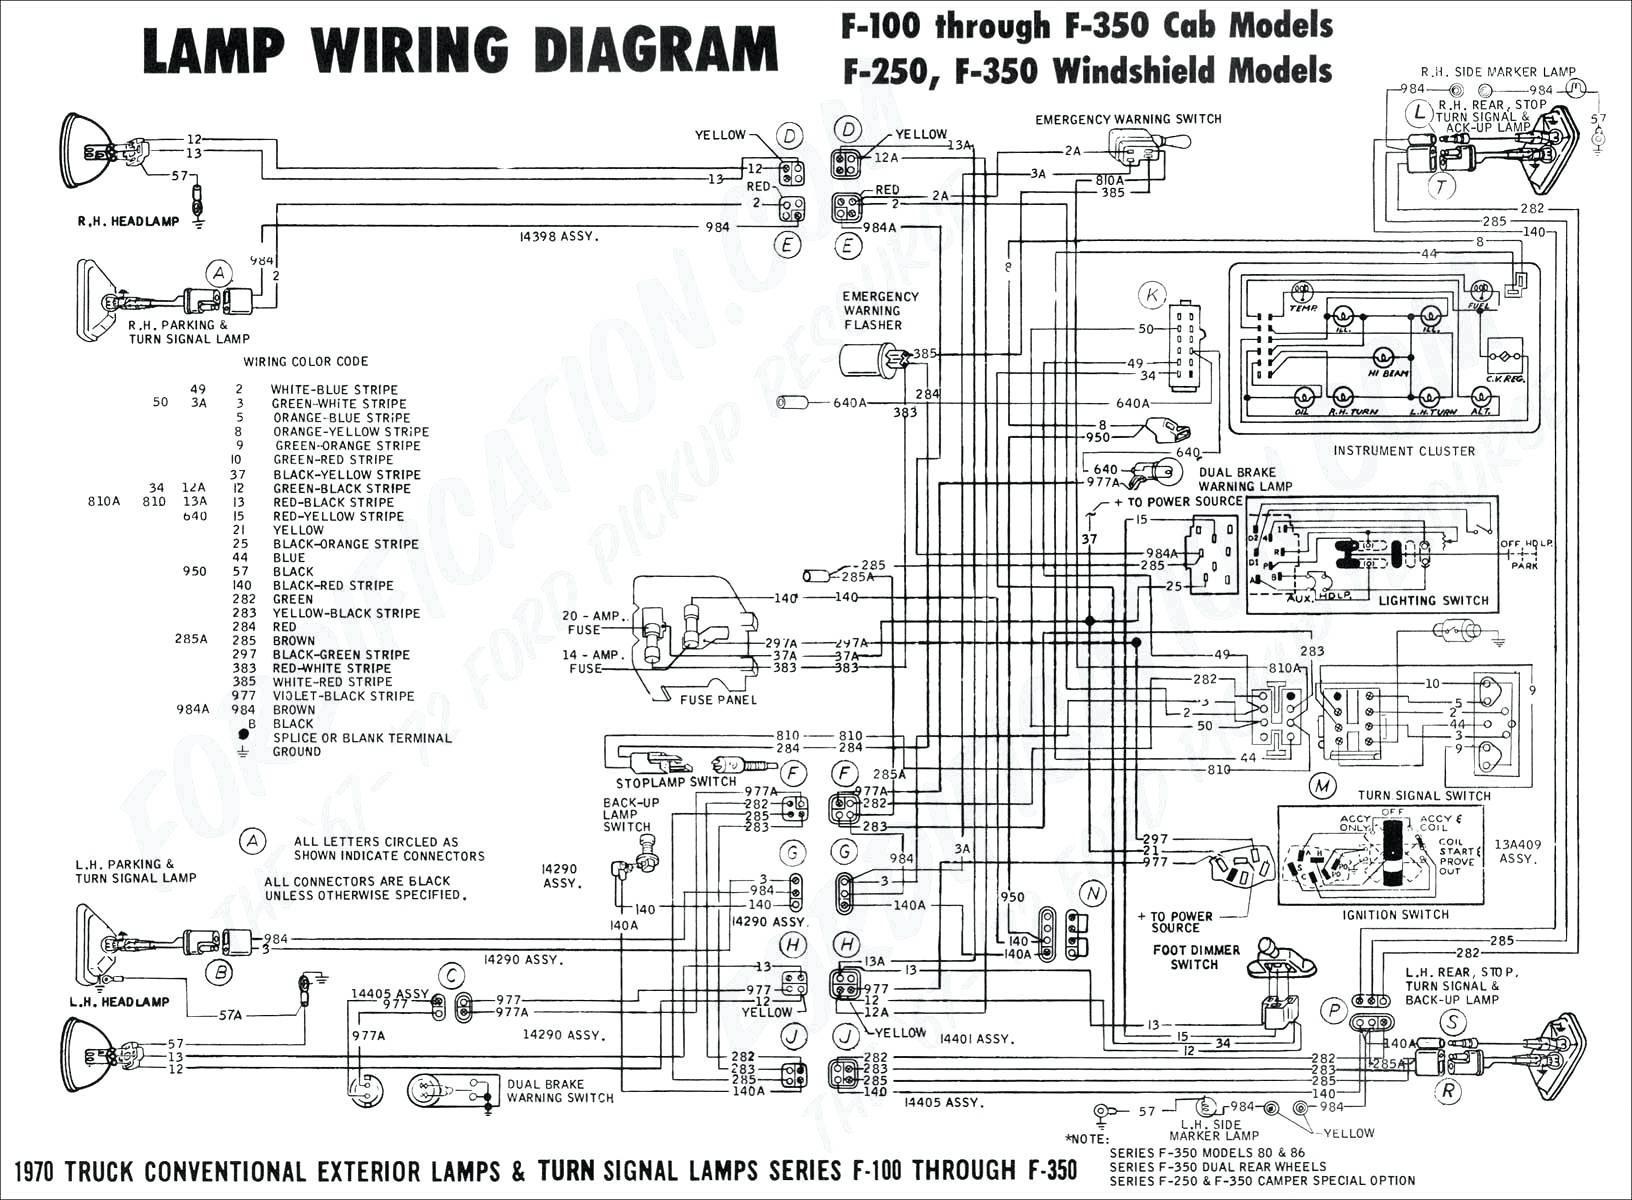 1981 Chevy Truck Fuse Box Diagram 1981 Chevy Van Wiring Diagram Another Blog About Wiring Diagram • Of 1981 Chevy Truck Fuse Box Diagram